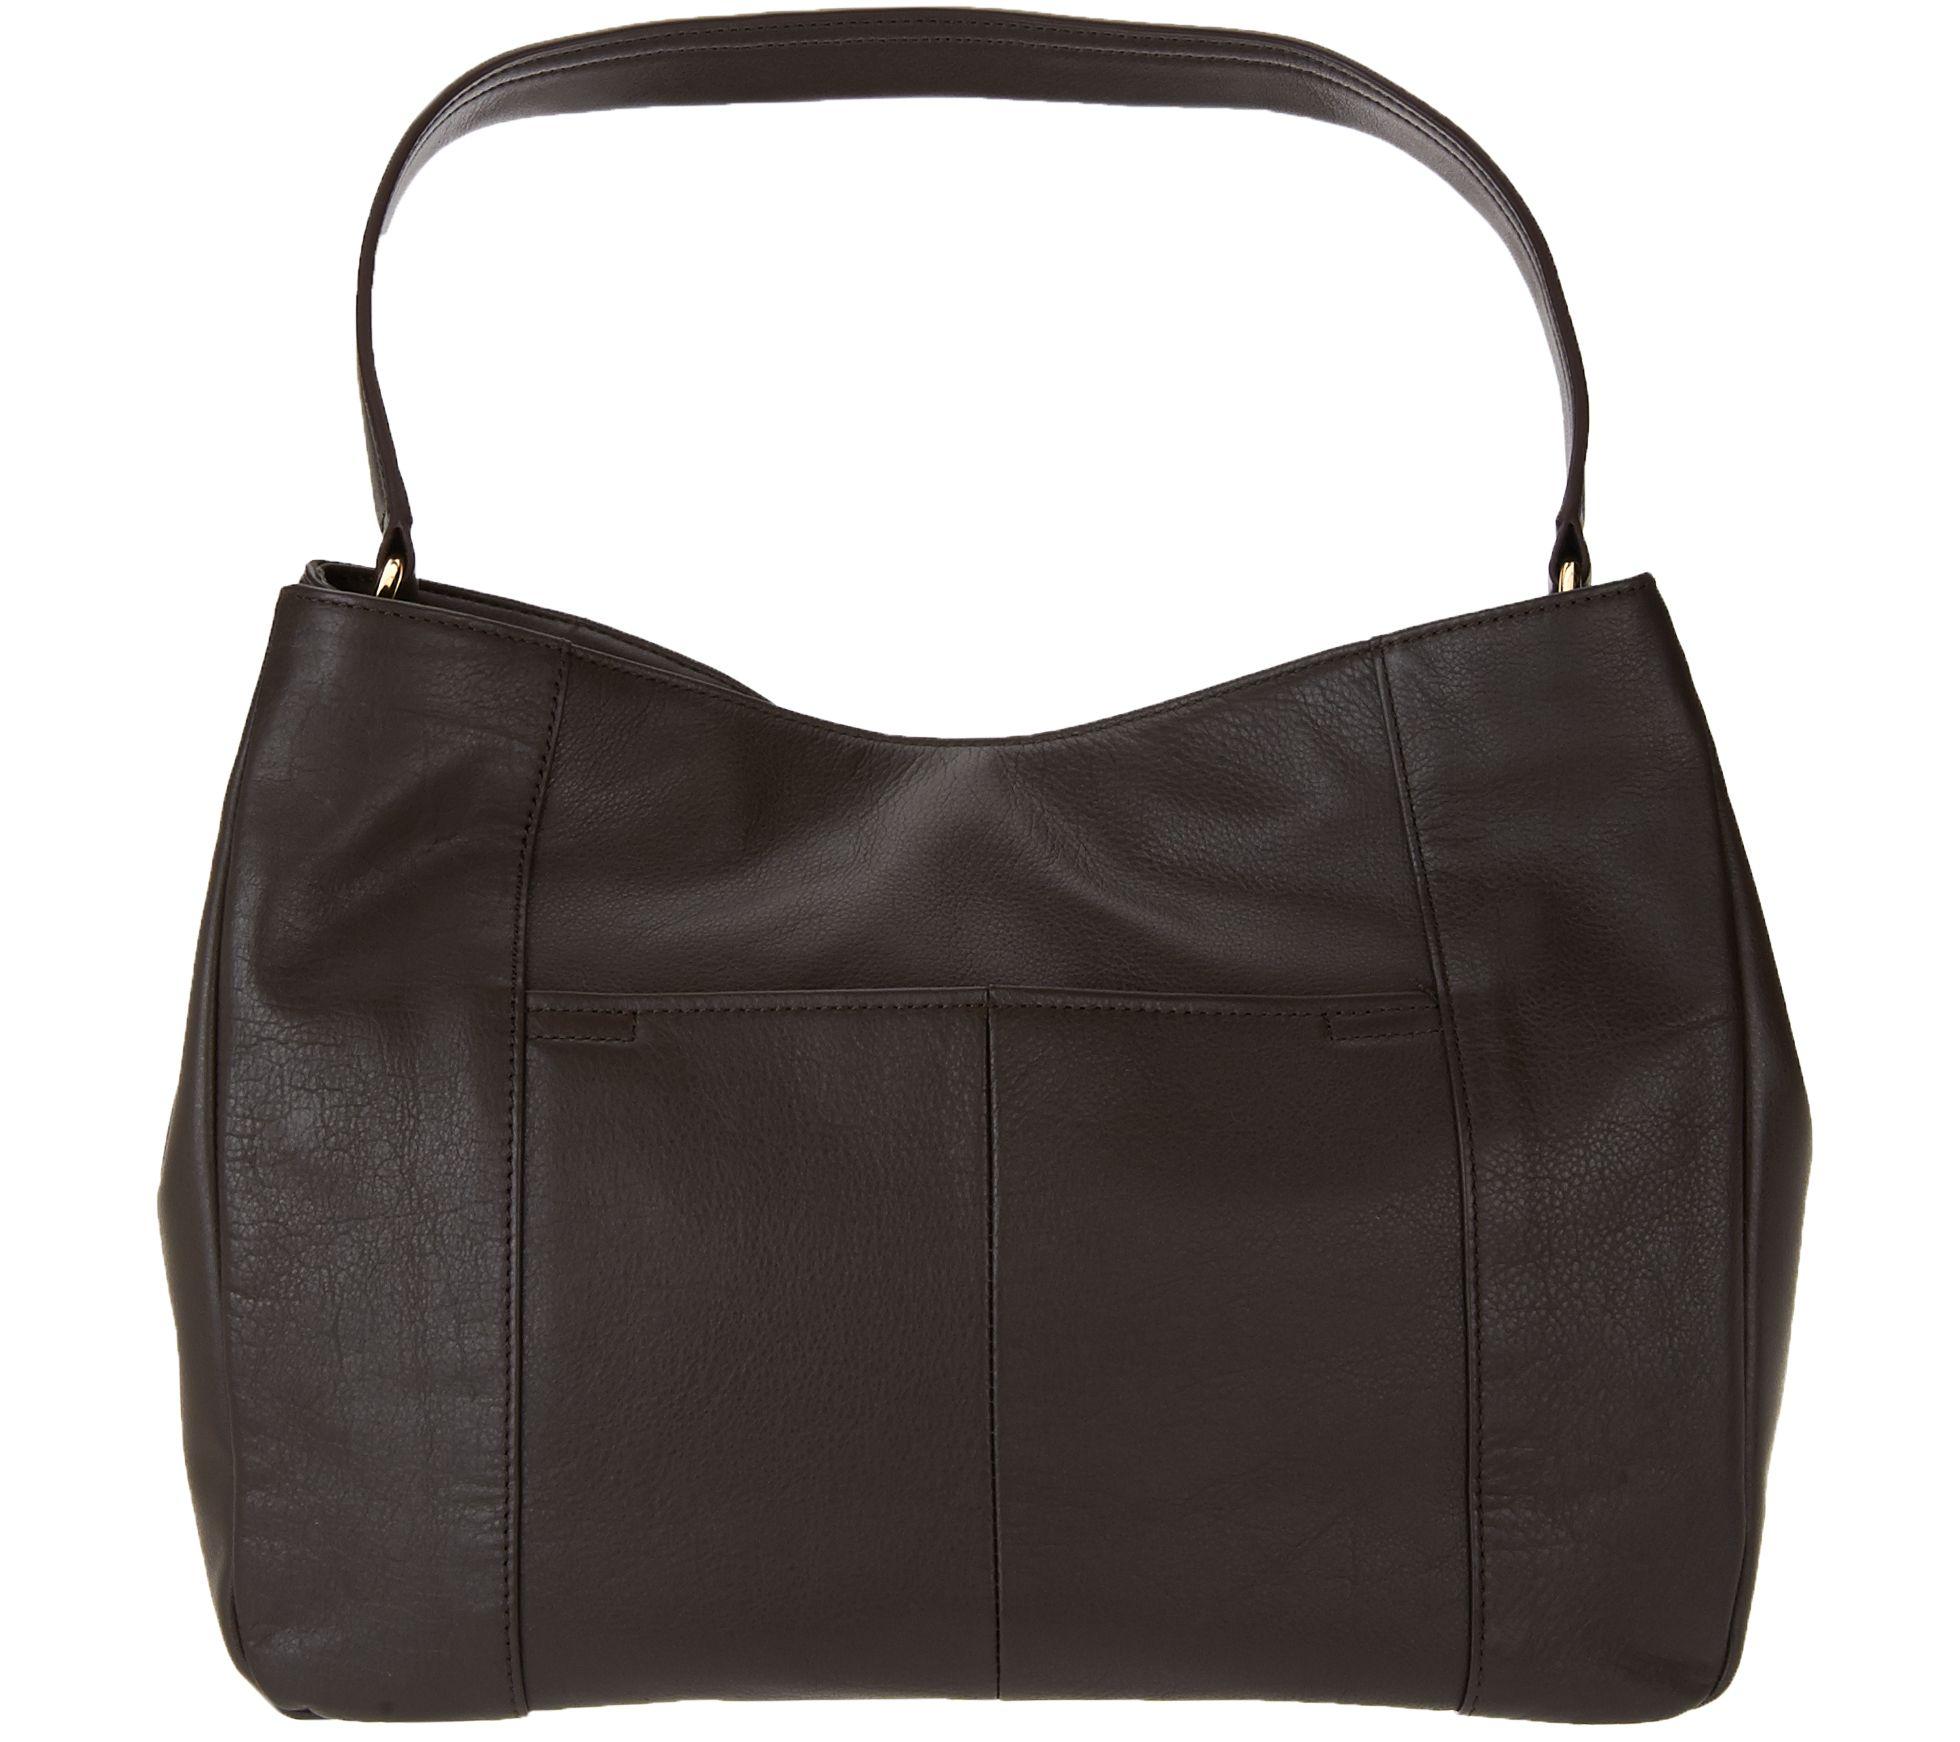 b339110ac3 Tignanello Glove Leather Large Hobo Bag - Page 1 — QVC.com